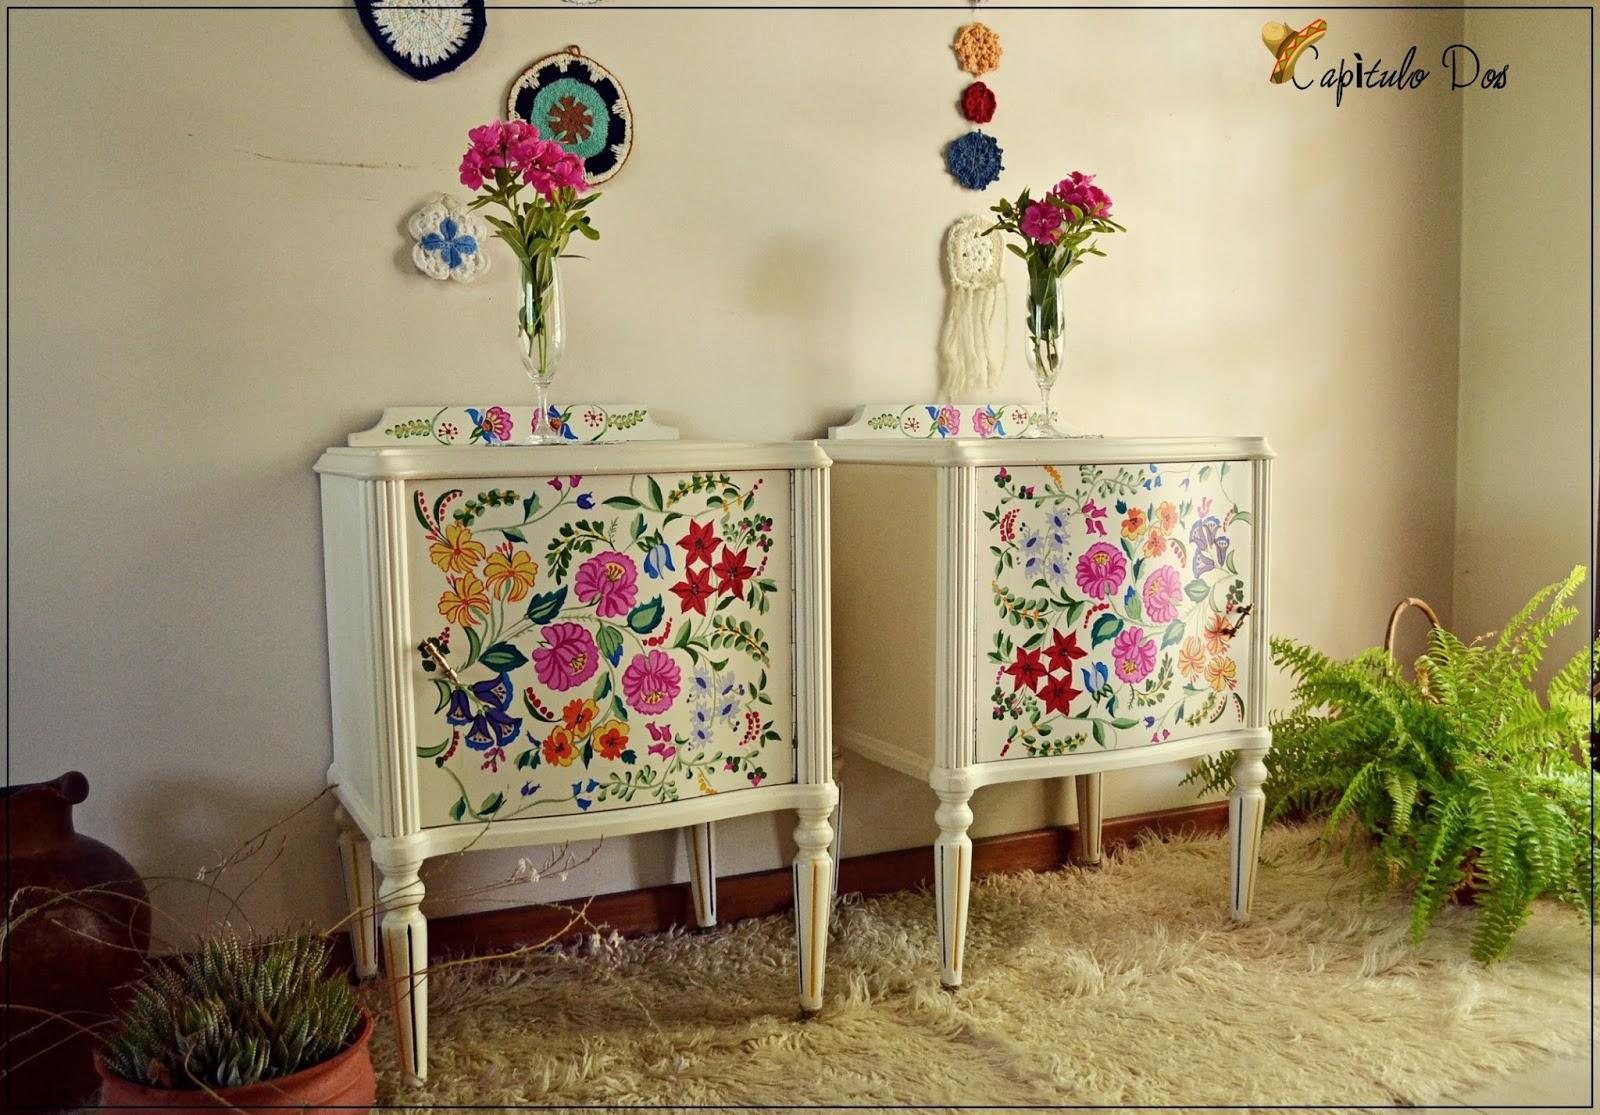 Capitulo dos inspiraci n bordado mexicano - Cajoneras decoradas ...